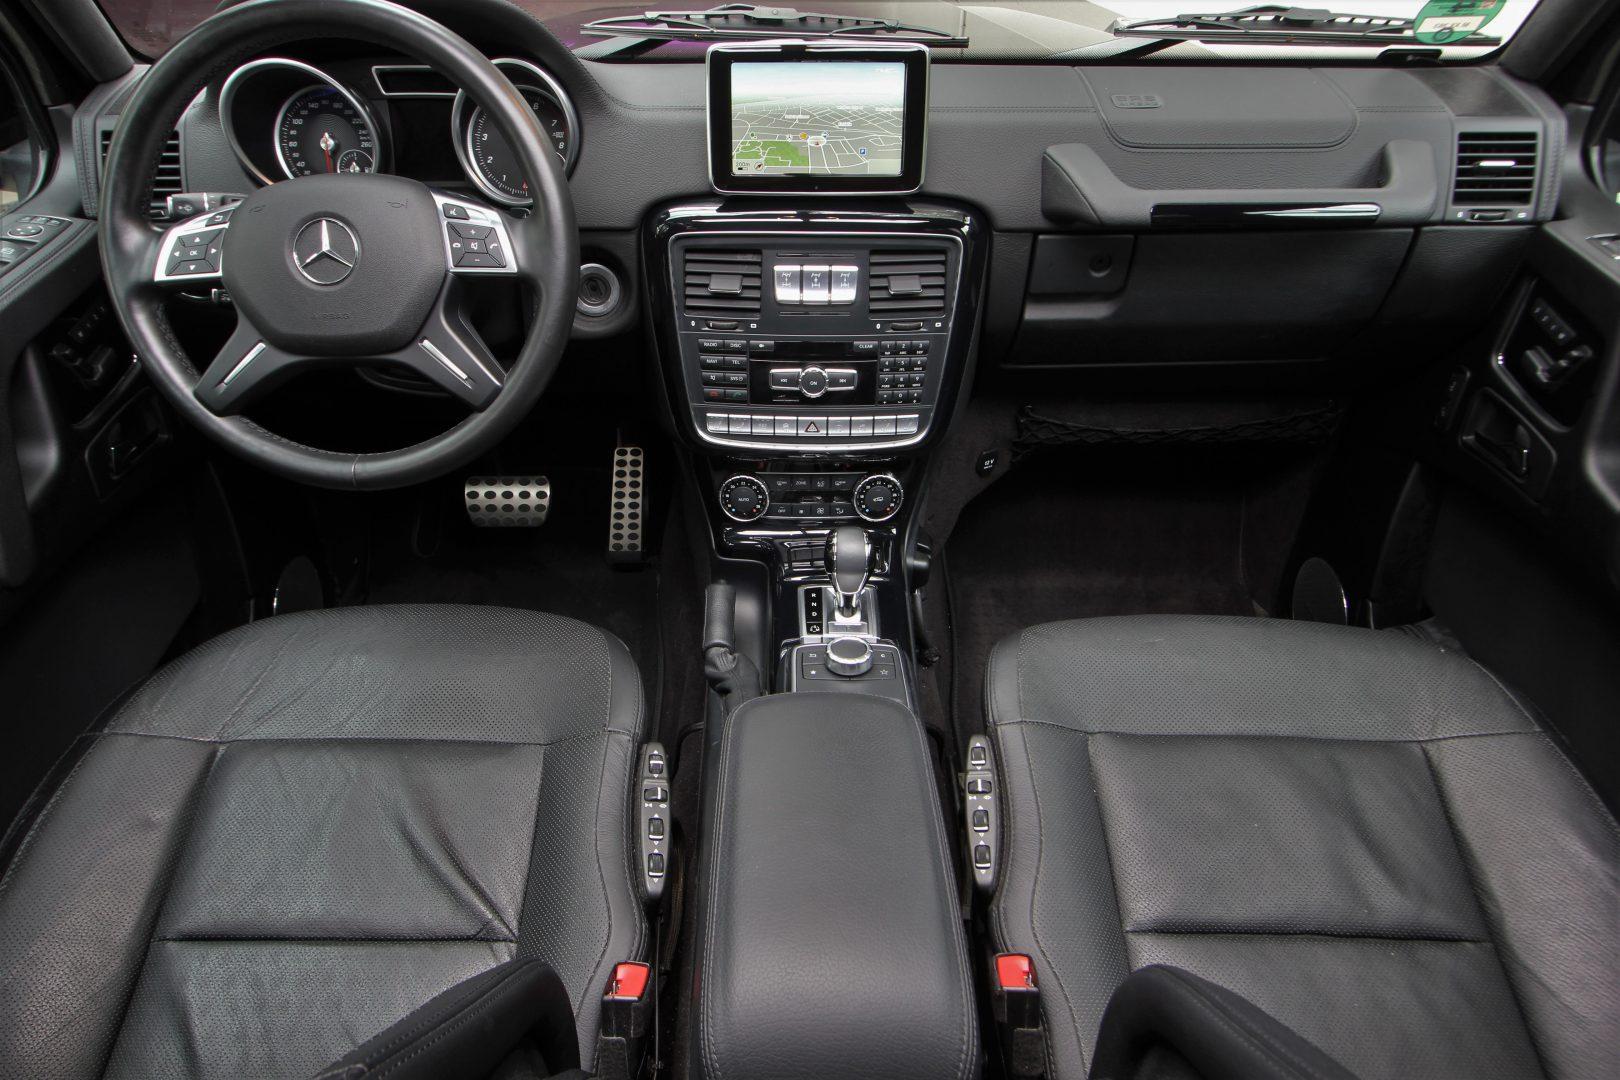 AIL Mercedes-Benz G 500 V8 Harman-Kardon Exklusiv Paket DAB 5